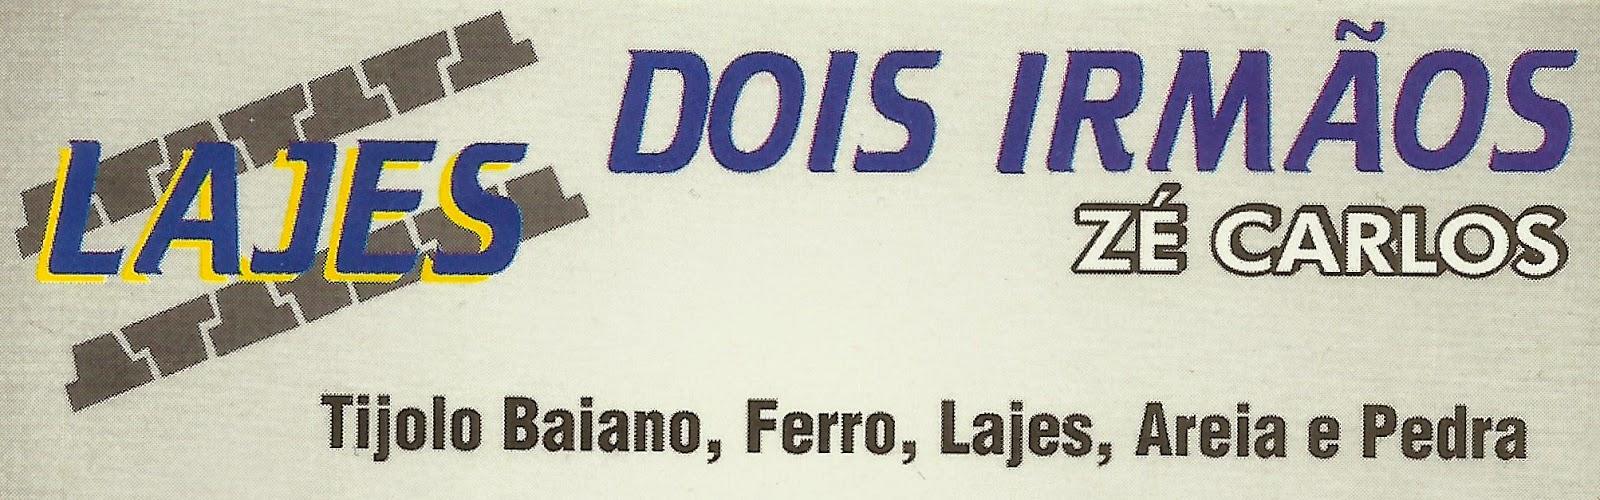 LAJES DOIS IRMÃOS Rua. Doutor Estelita Ribas, 691 Centro - Itapeva - SP Cep: 18409-560 tel: (15) 3524-3056